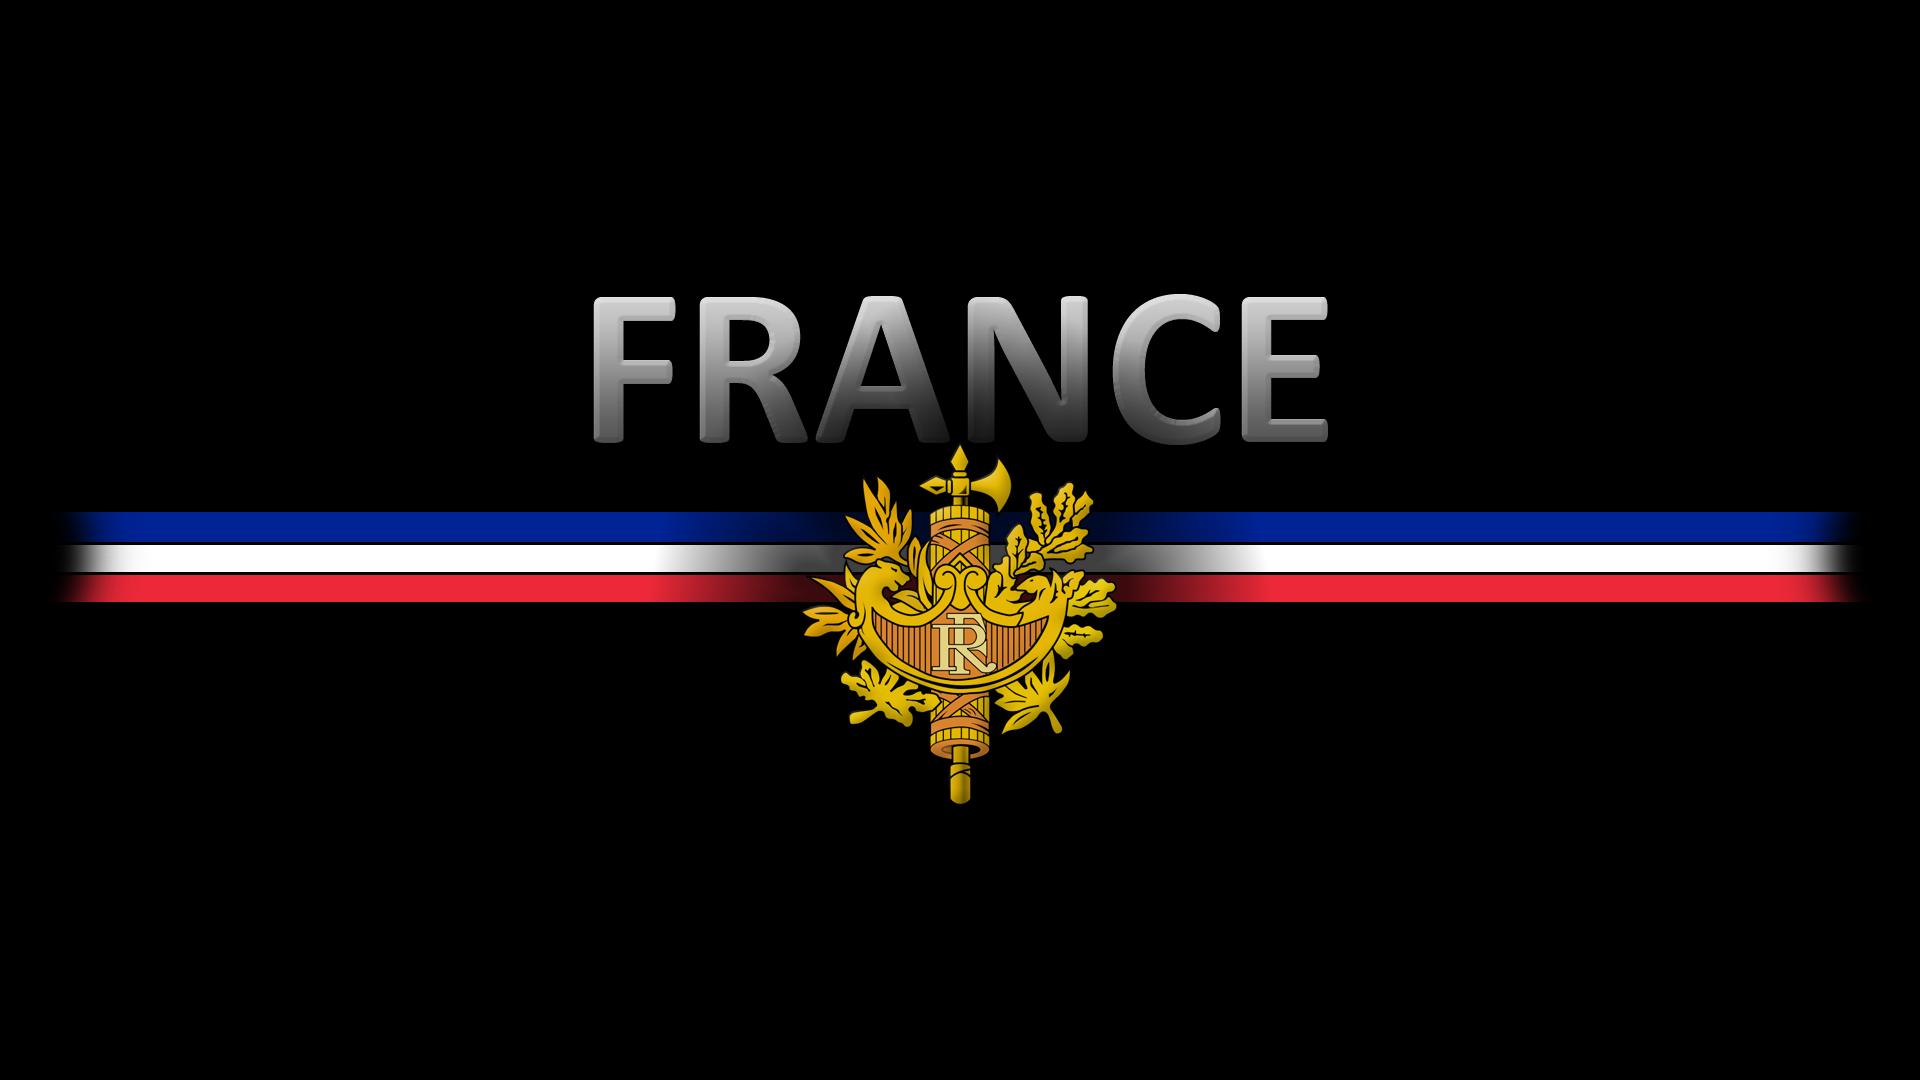 Wallpaper France Download in 2019 France wallpaper France 1920x1080